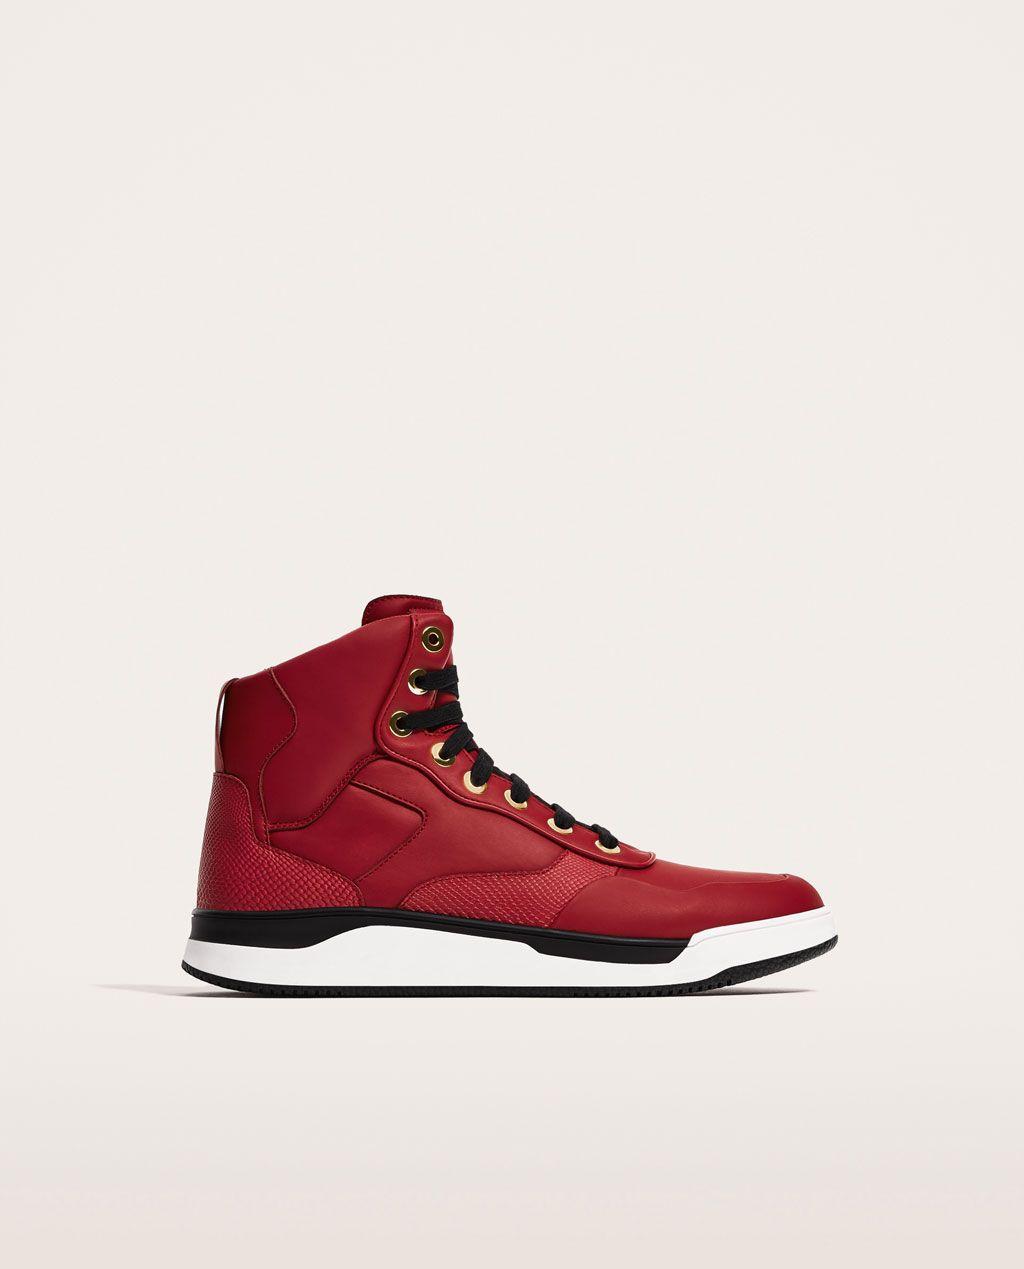 Chaussures automne rouges homme tMMpatBO